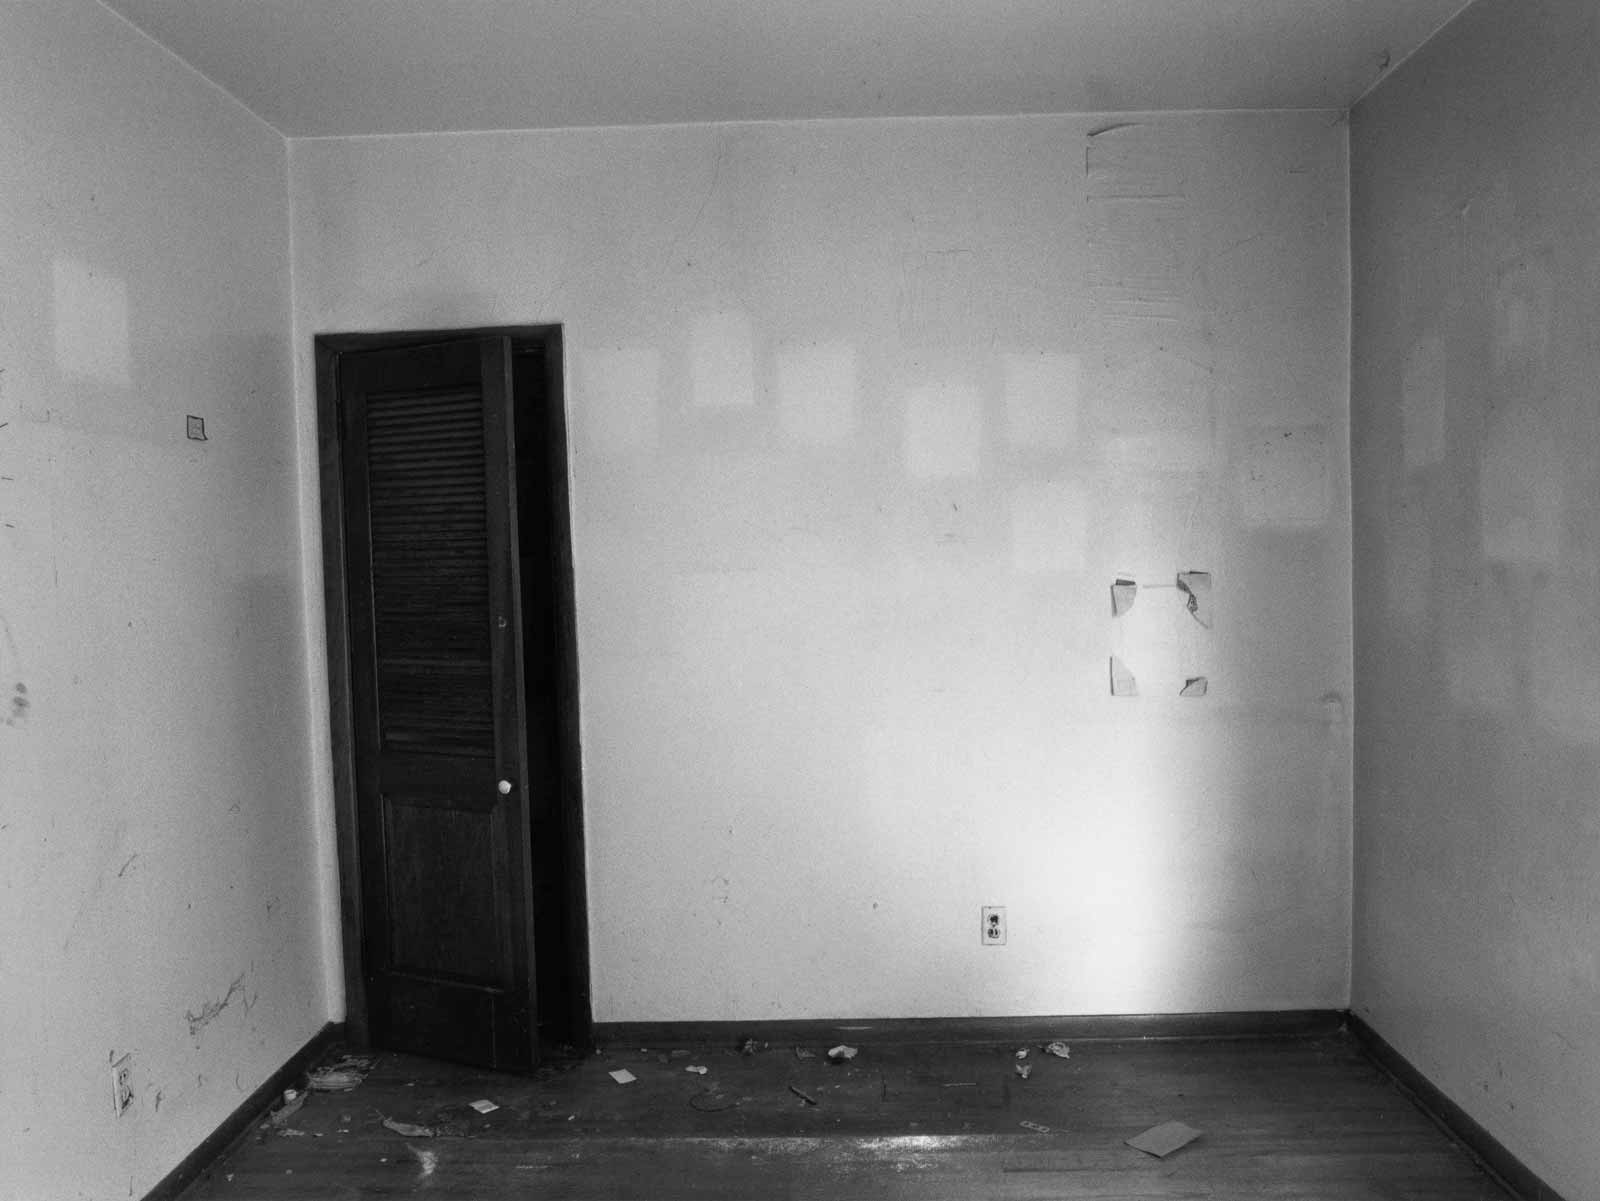 frazier-room-i-share